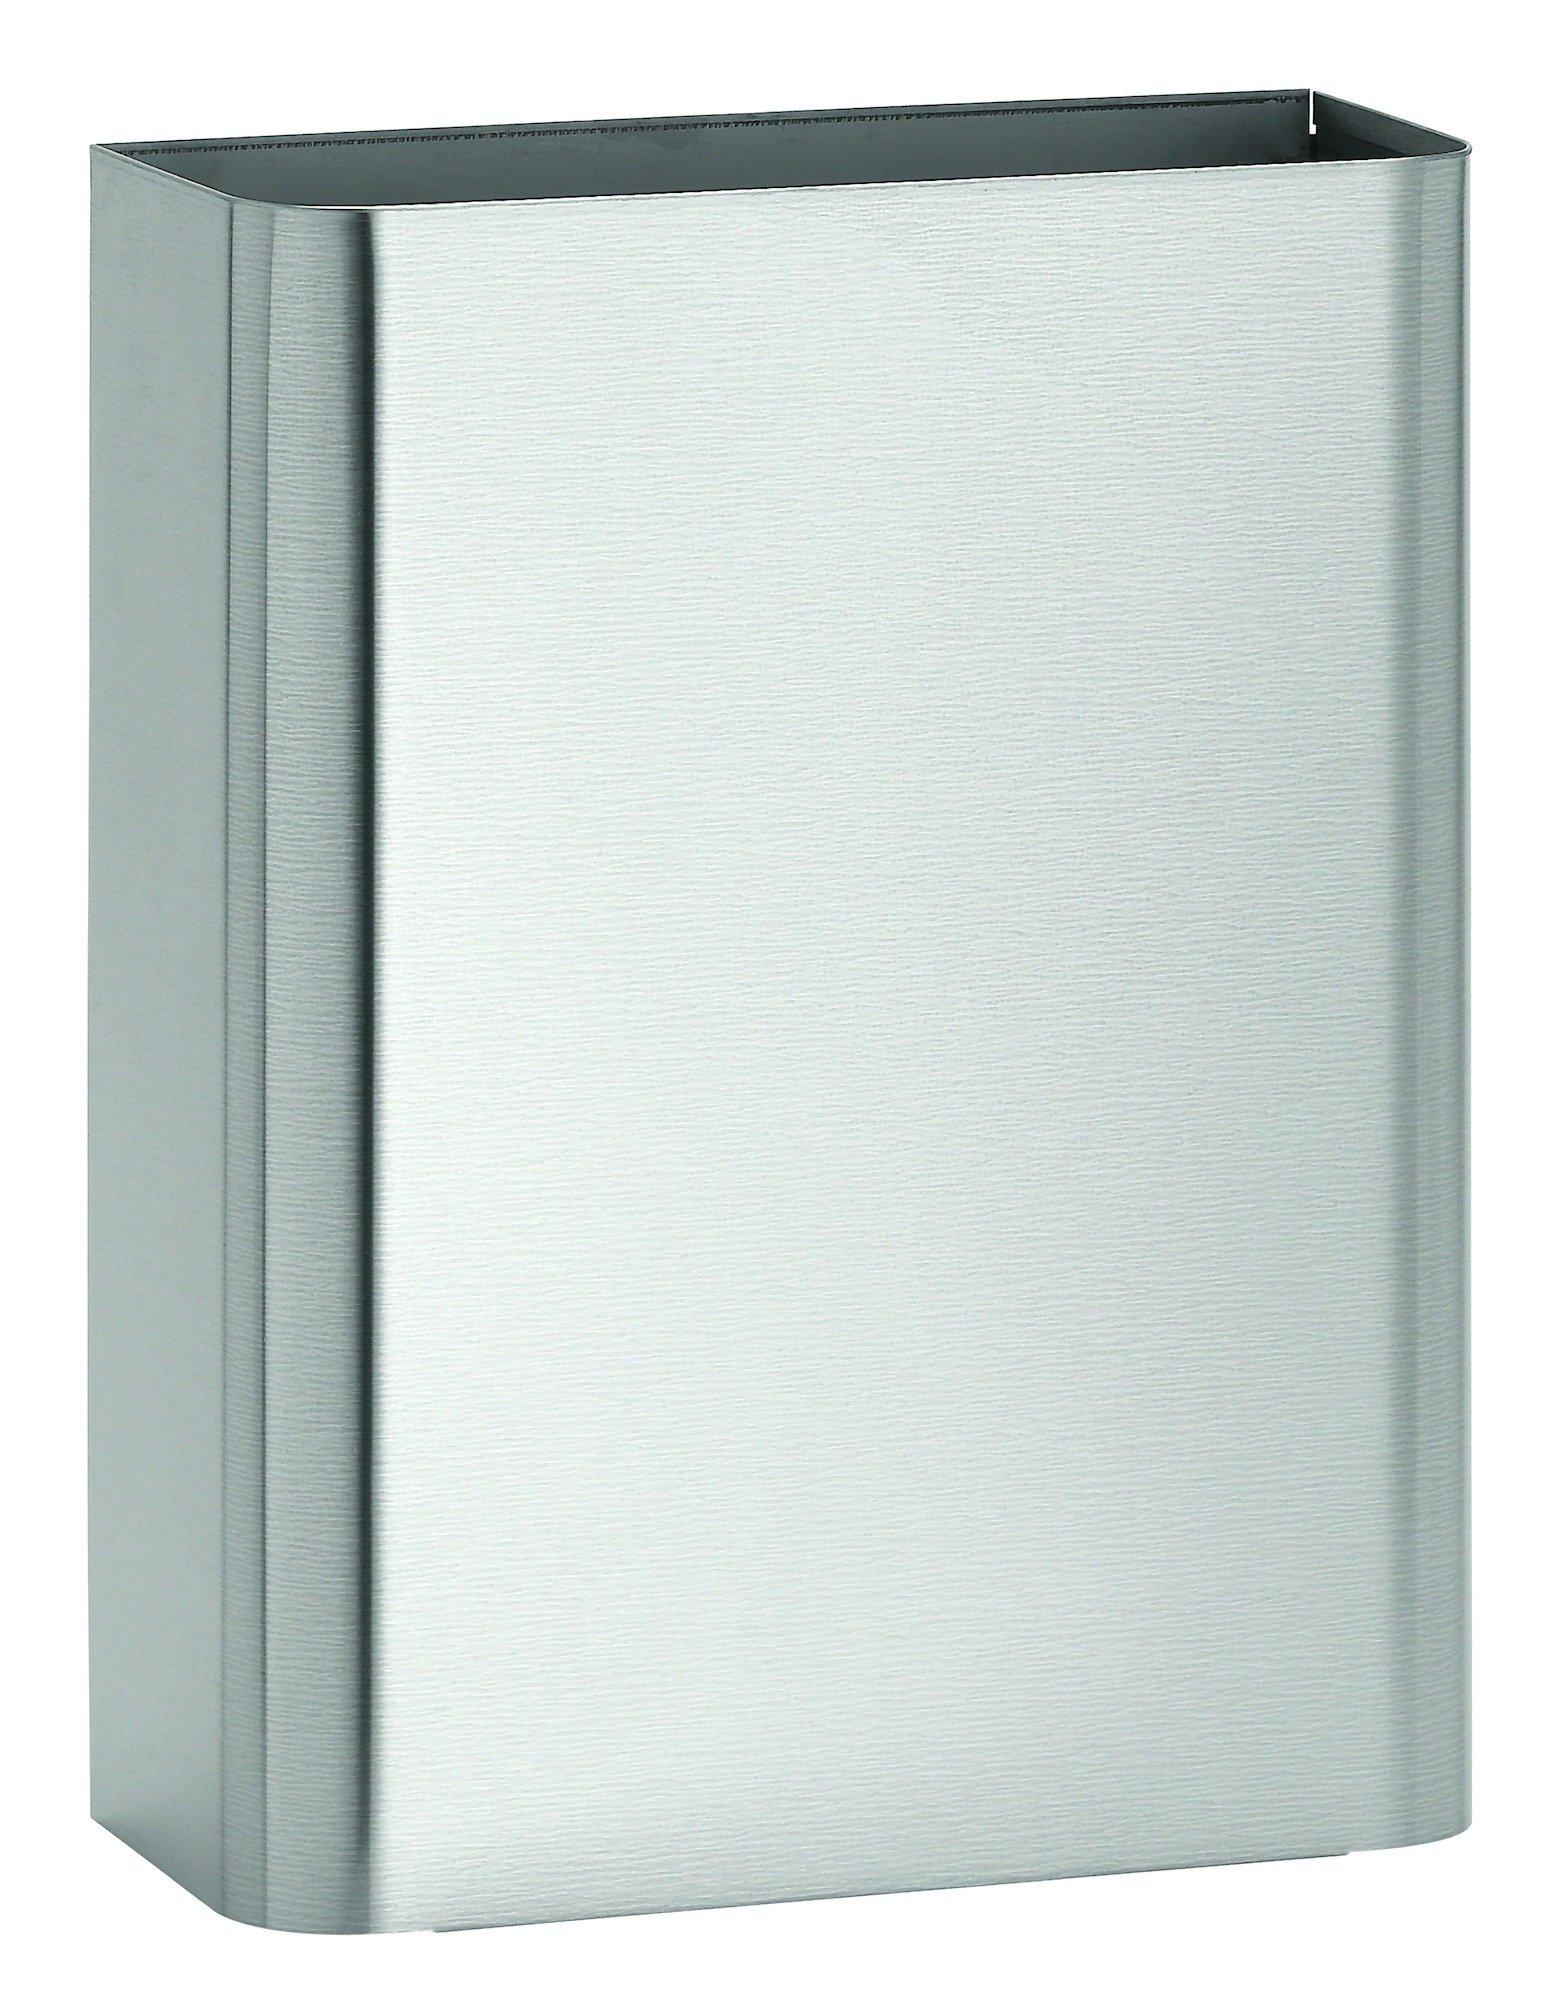 Bradley Waste Receptacle 357 | Accurate Door and Hardware, Inc